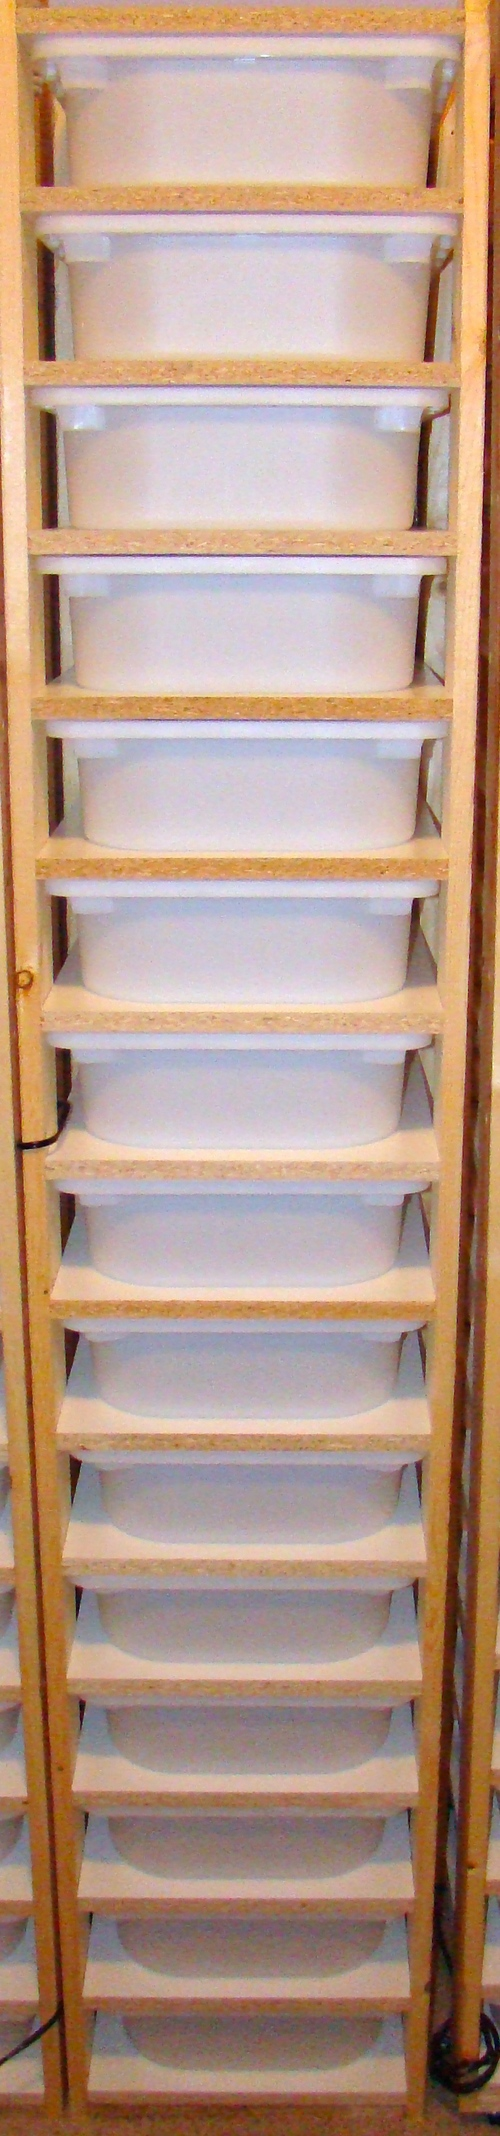 15 bin juvi rack system